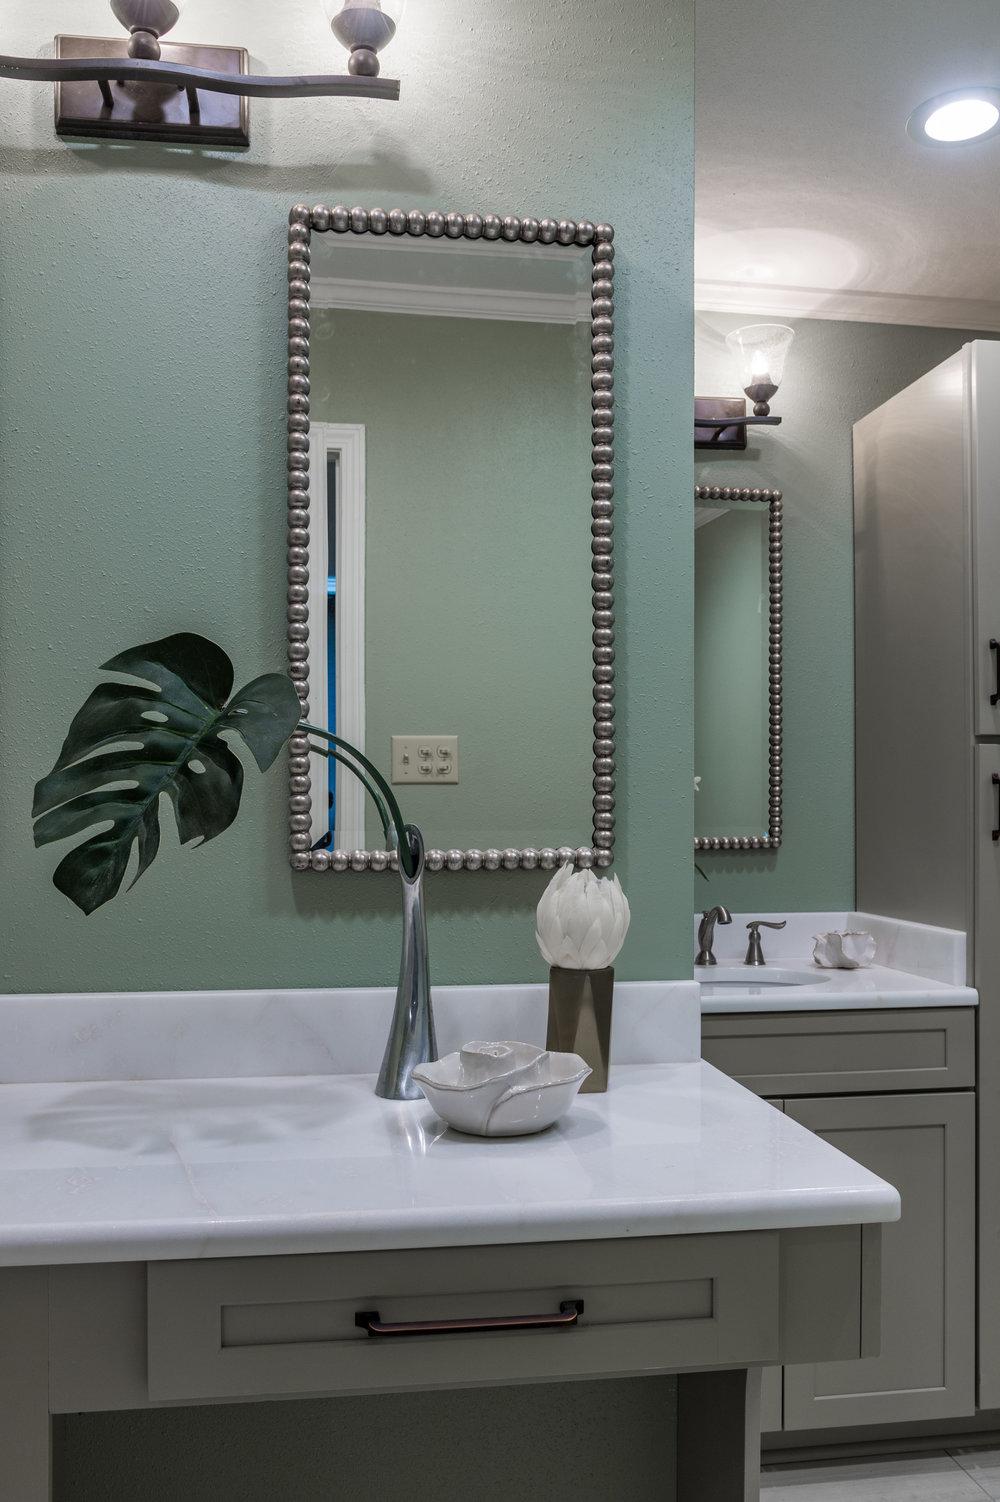 bathroom vanity decor new orleans traditional interior design khb interiors